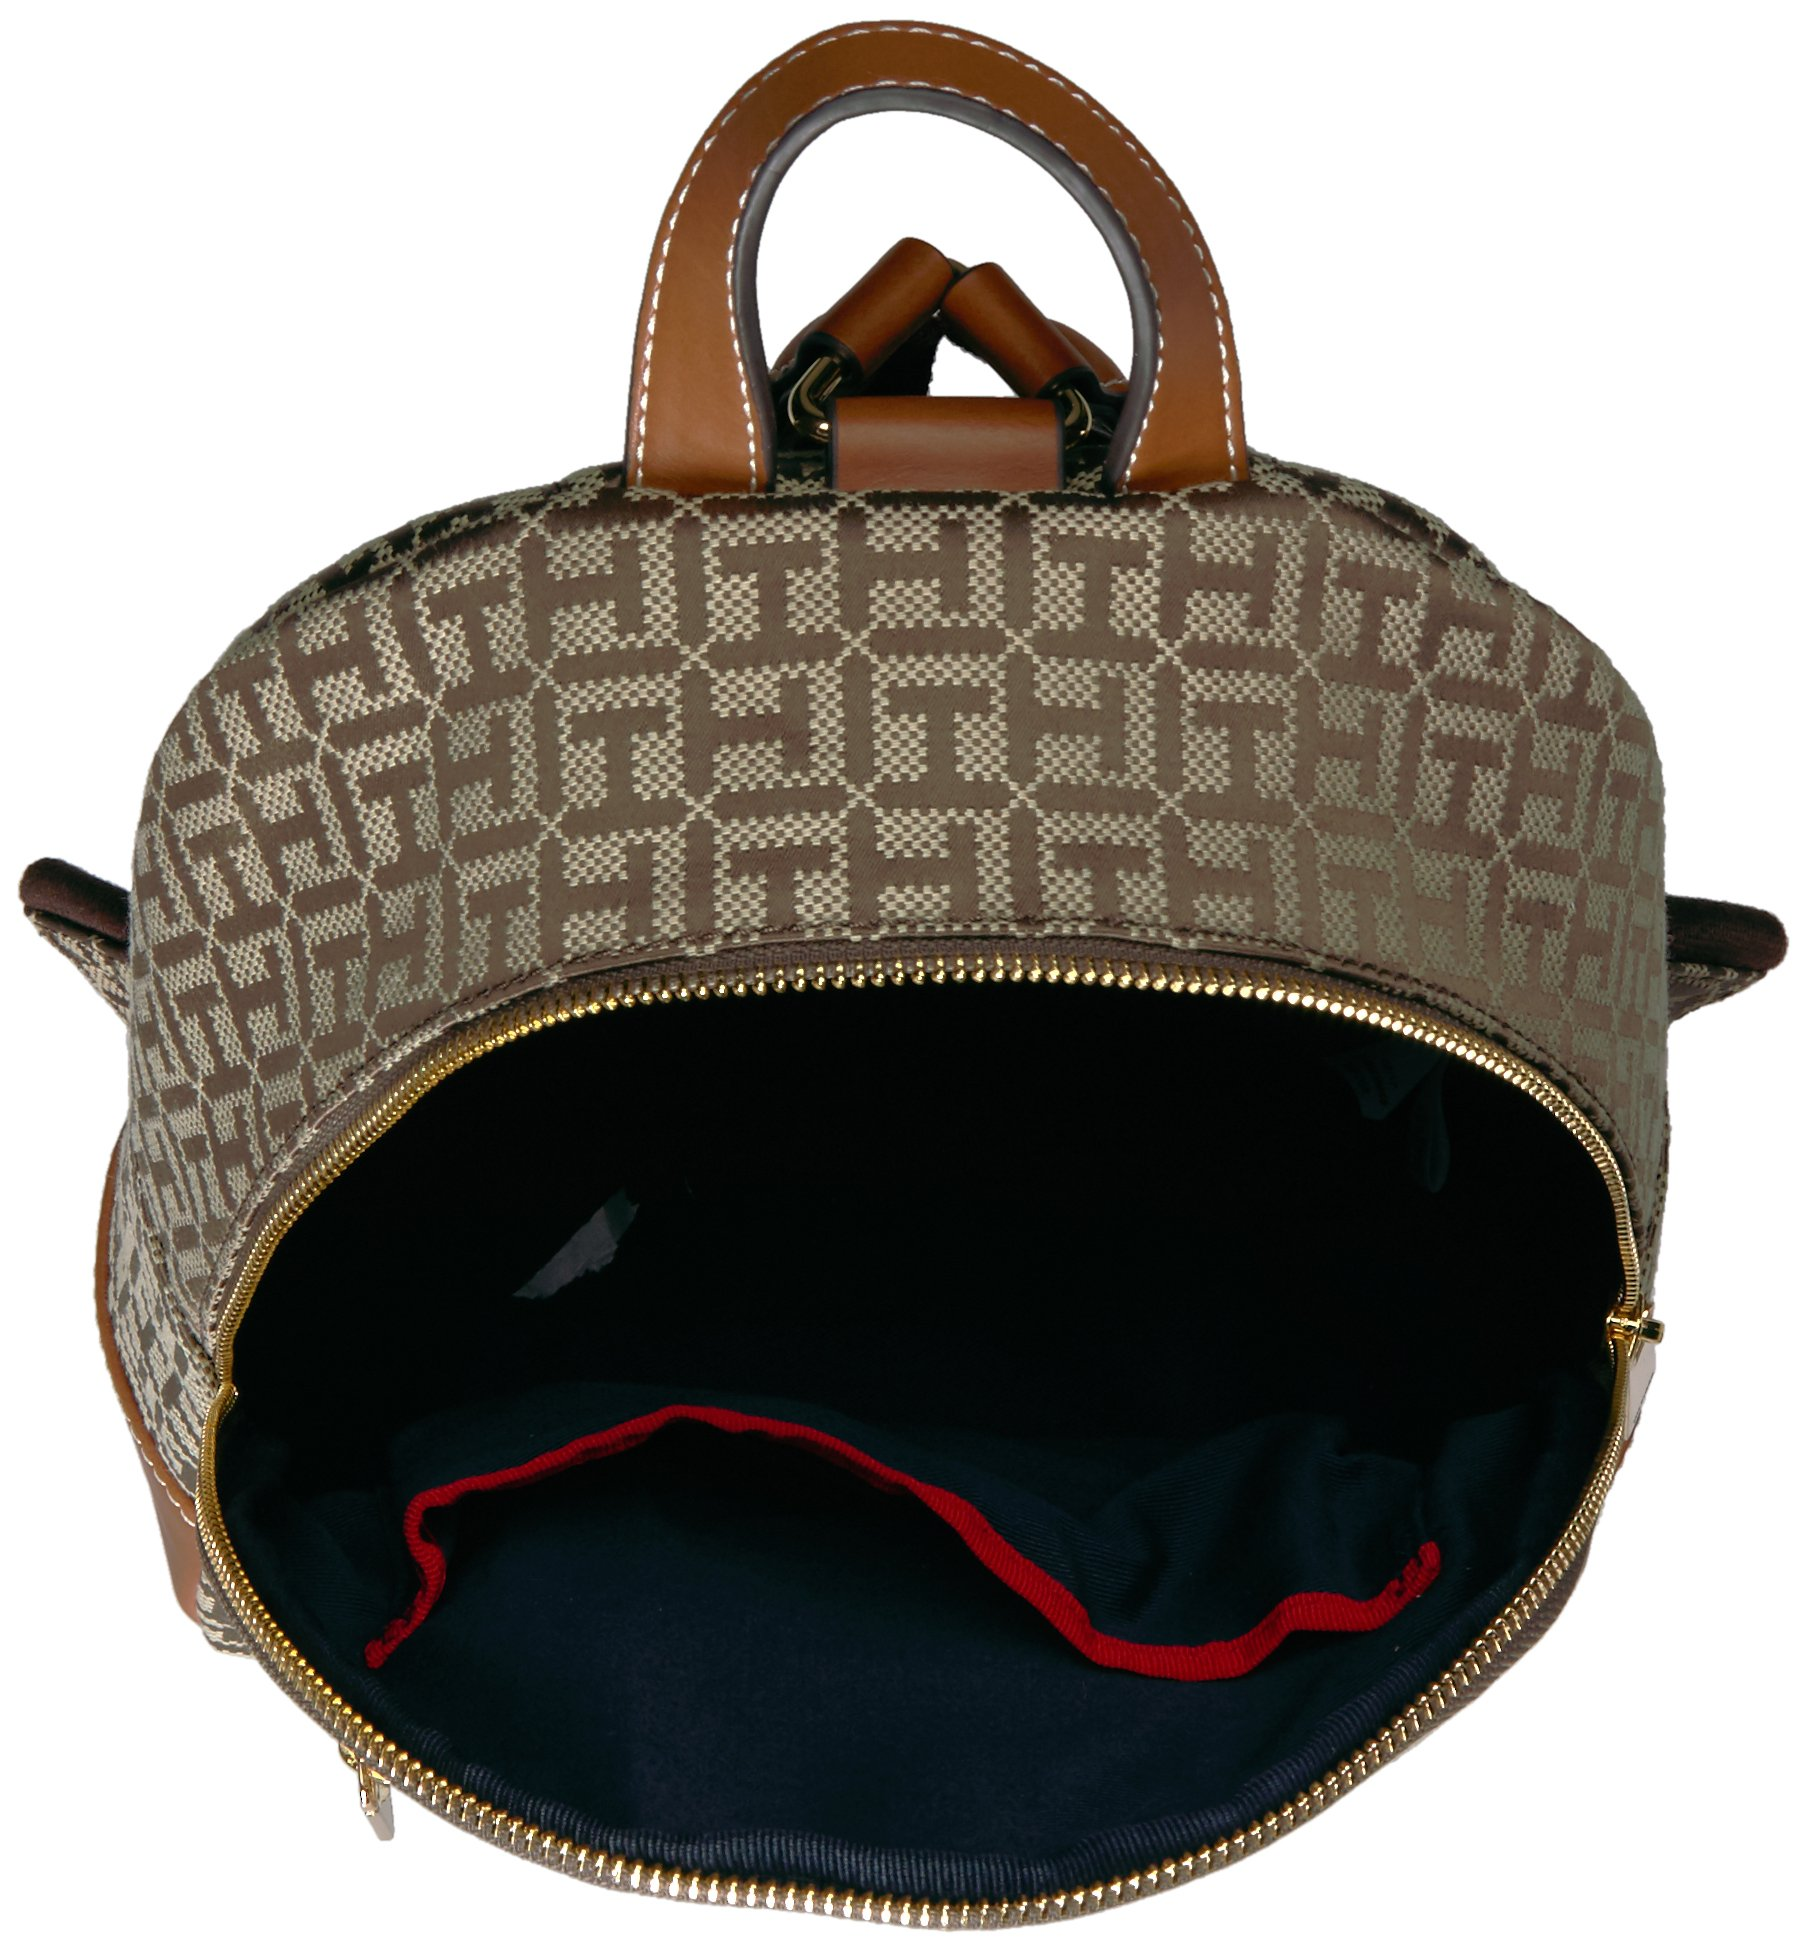 Tommy Hilfiger Women's Backpack Jaden, Tan Dark Chocolate by Tommy Hilfiger (Image #3)